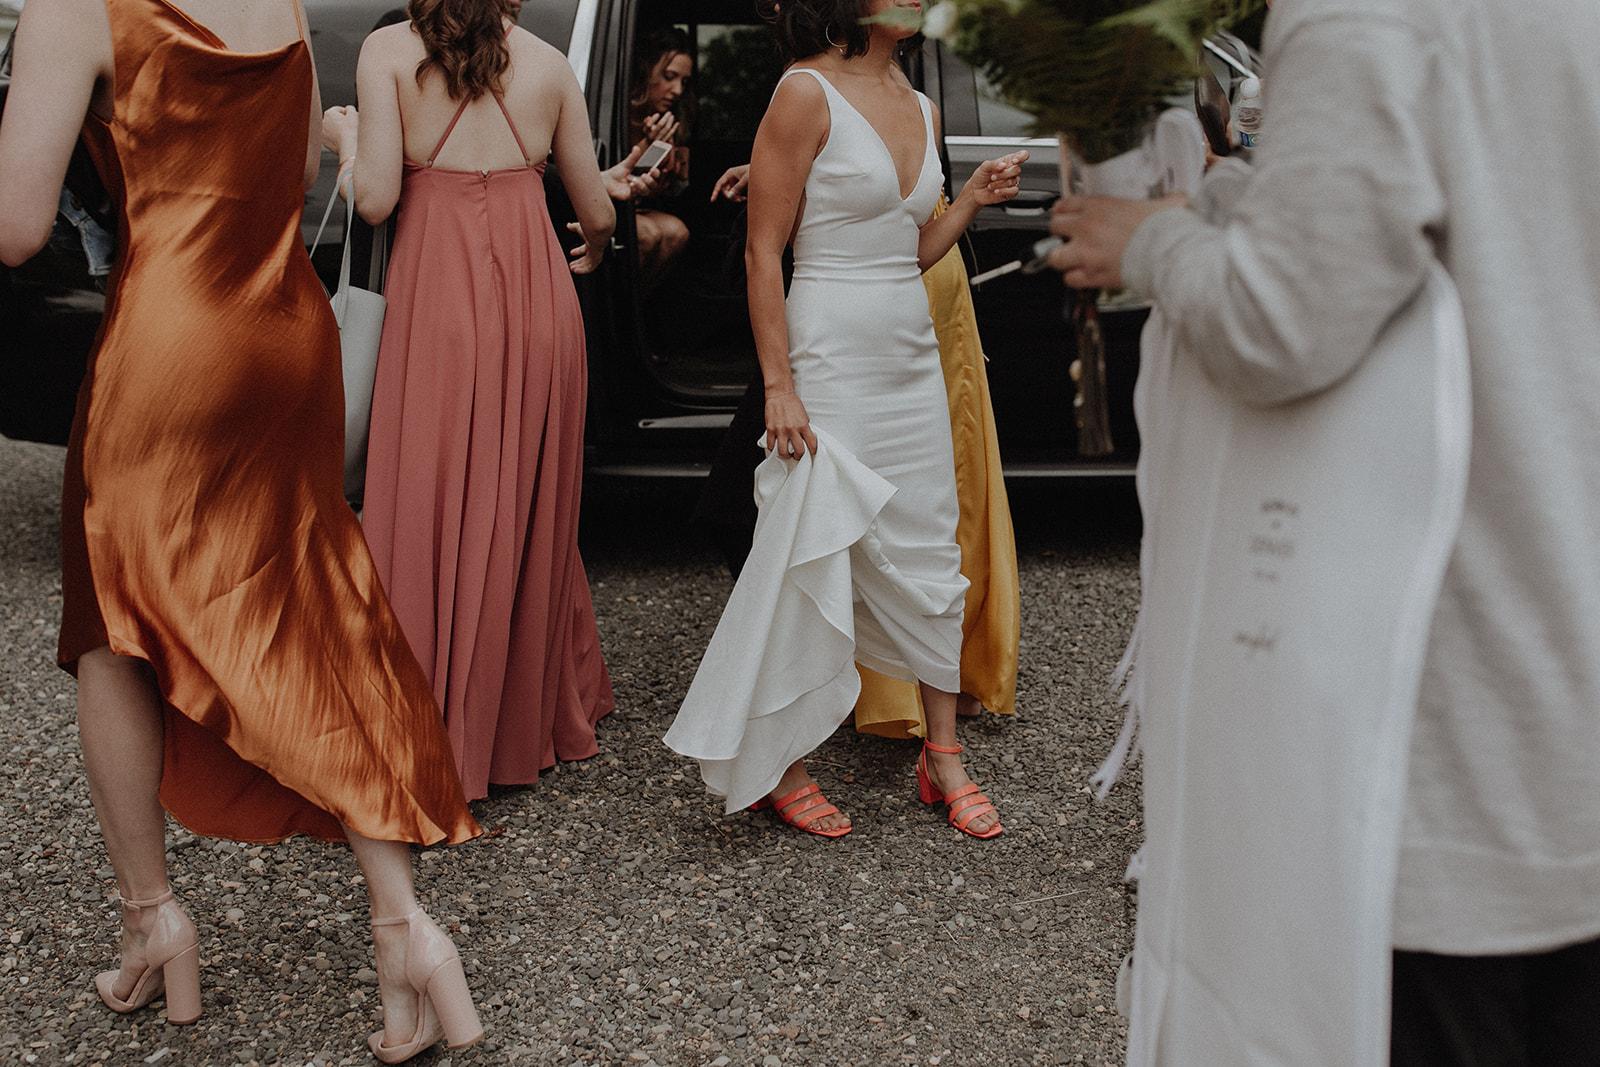 cortney_skye_wedding_june2019-53.jpg